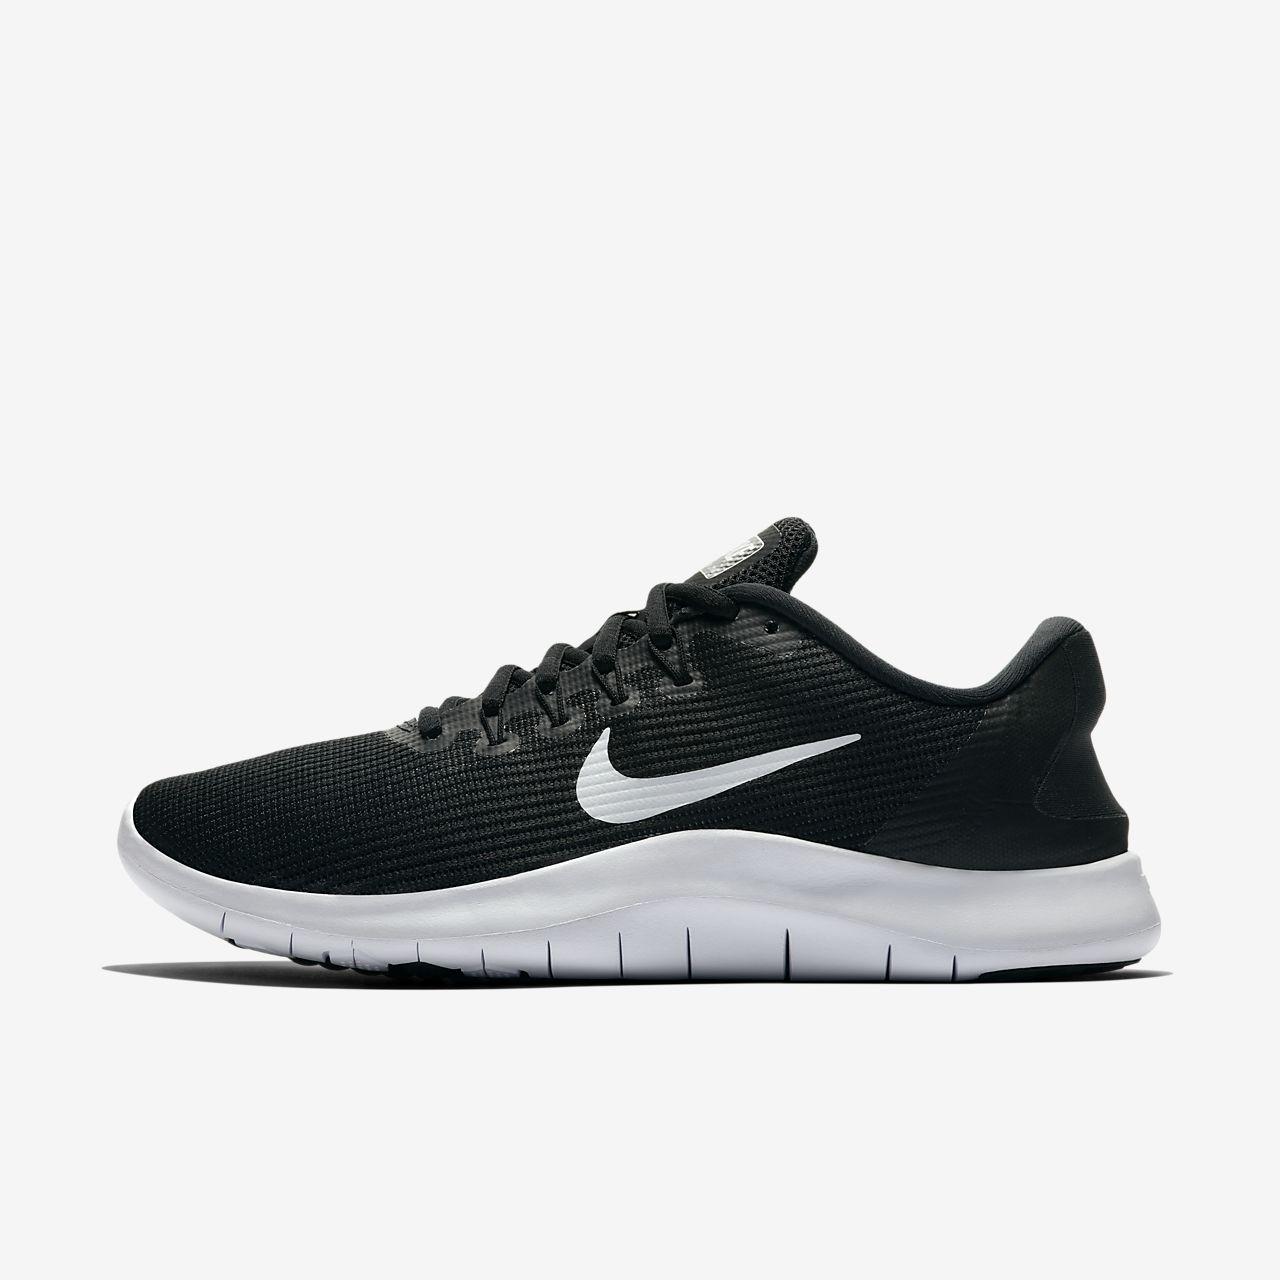 nike boots schwarz, Nike AIR MAX 2015 Laufschuhe Damen